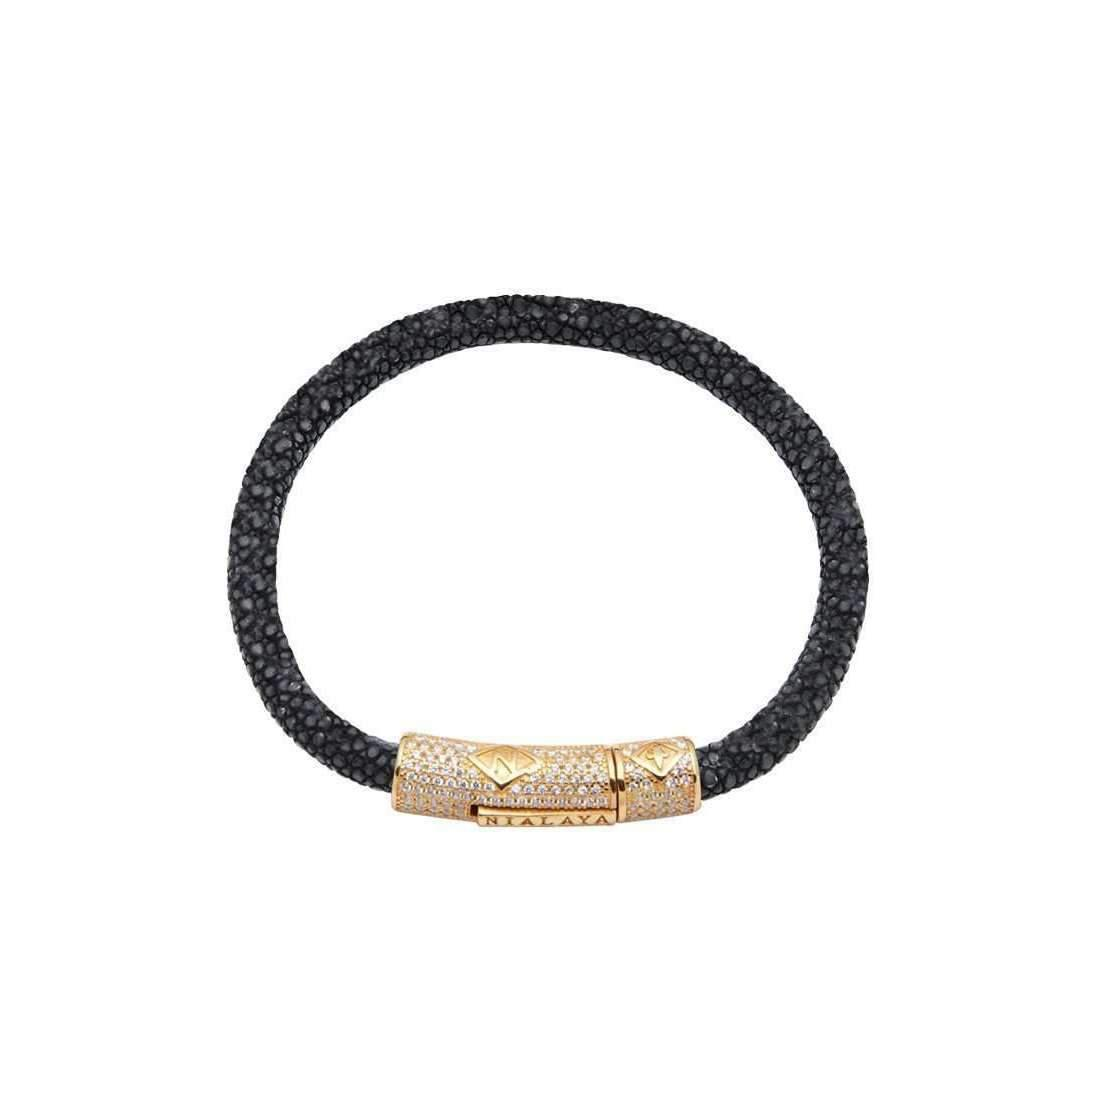 Nialaya Black Stingray Bracelet with Black Lock - Extra Large k3Jvg2baiv